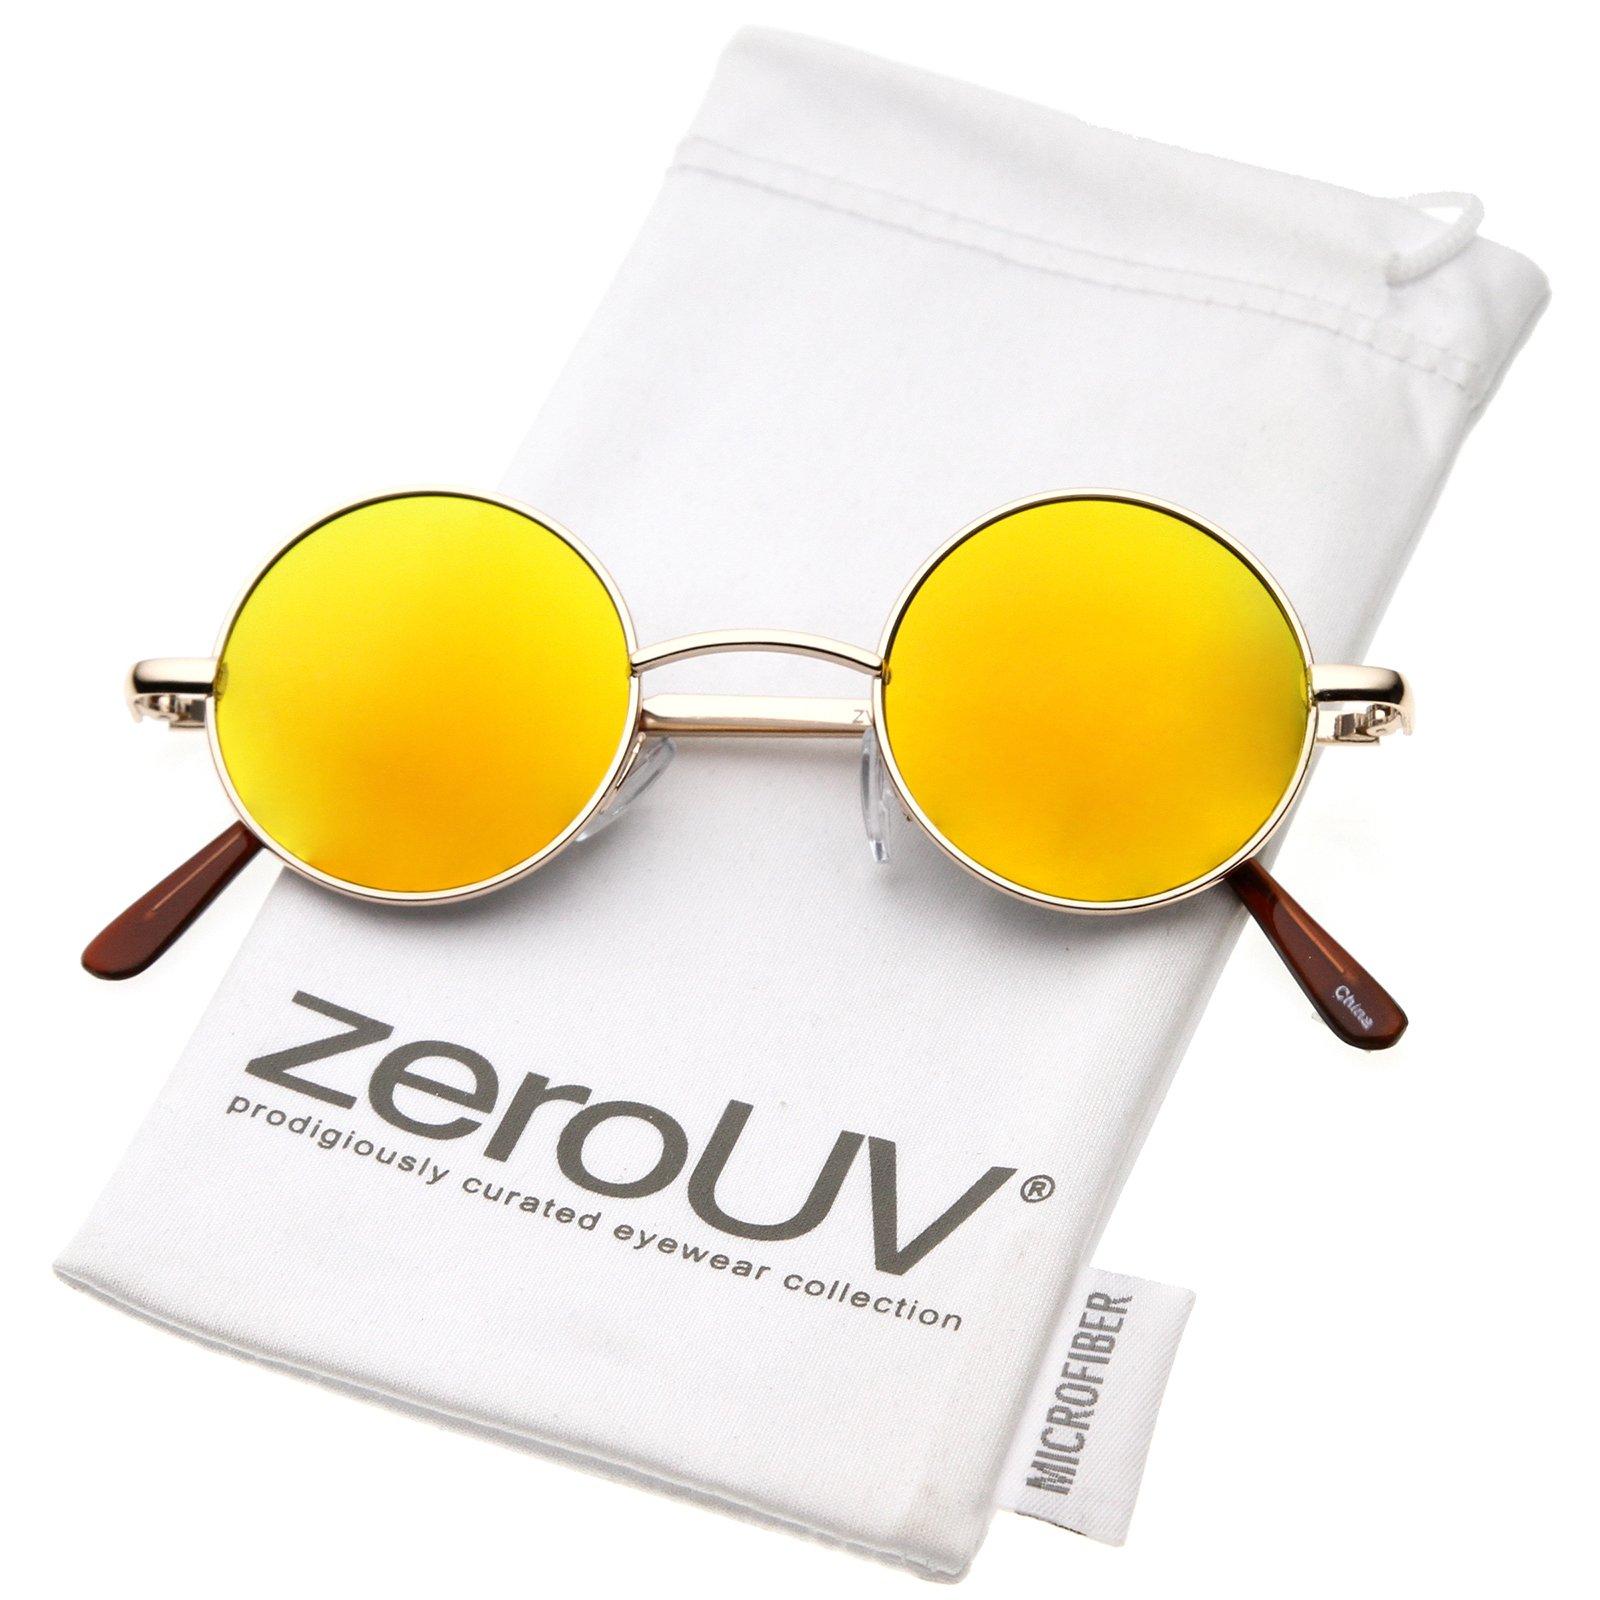 zeroUV - Retro Round Sunglasses for Men Women with Color Mirrored Lens John Lennon Glasses (Gold/Orange) by zeroUV